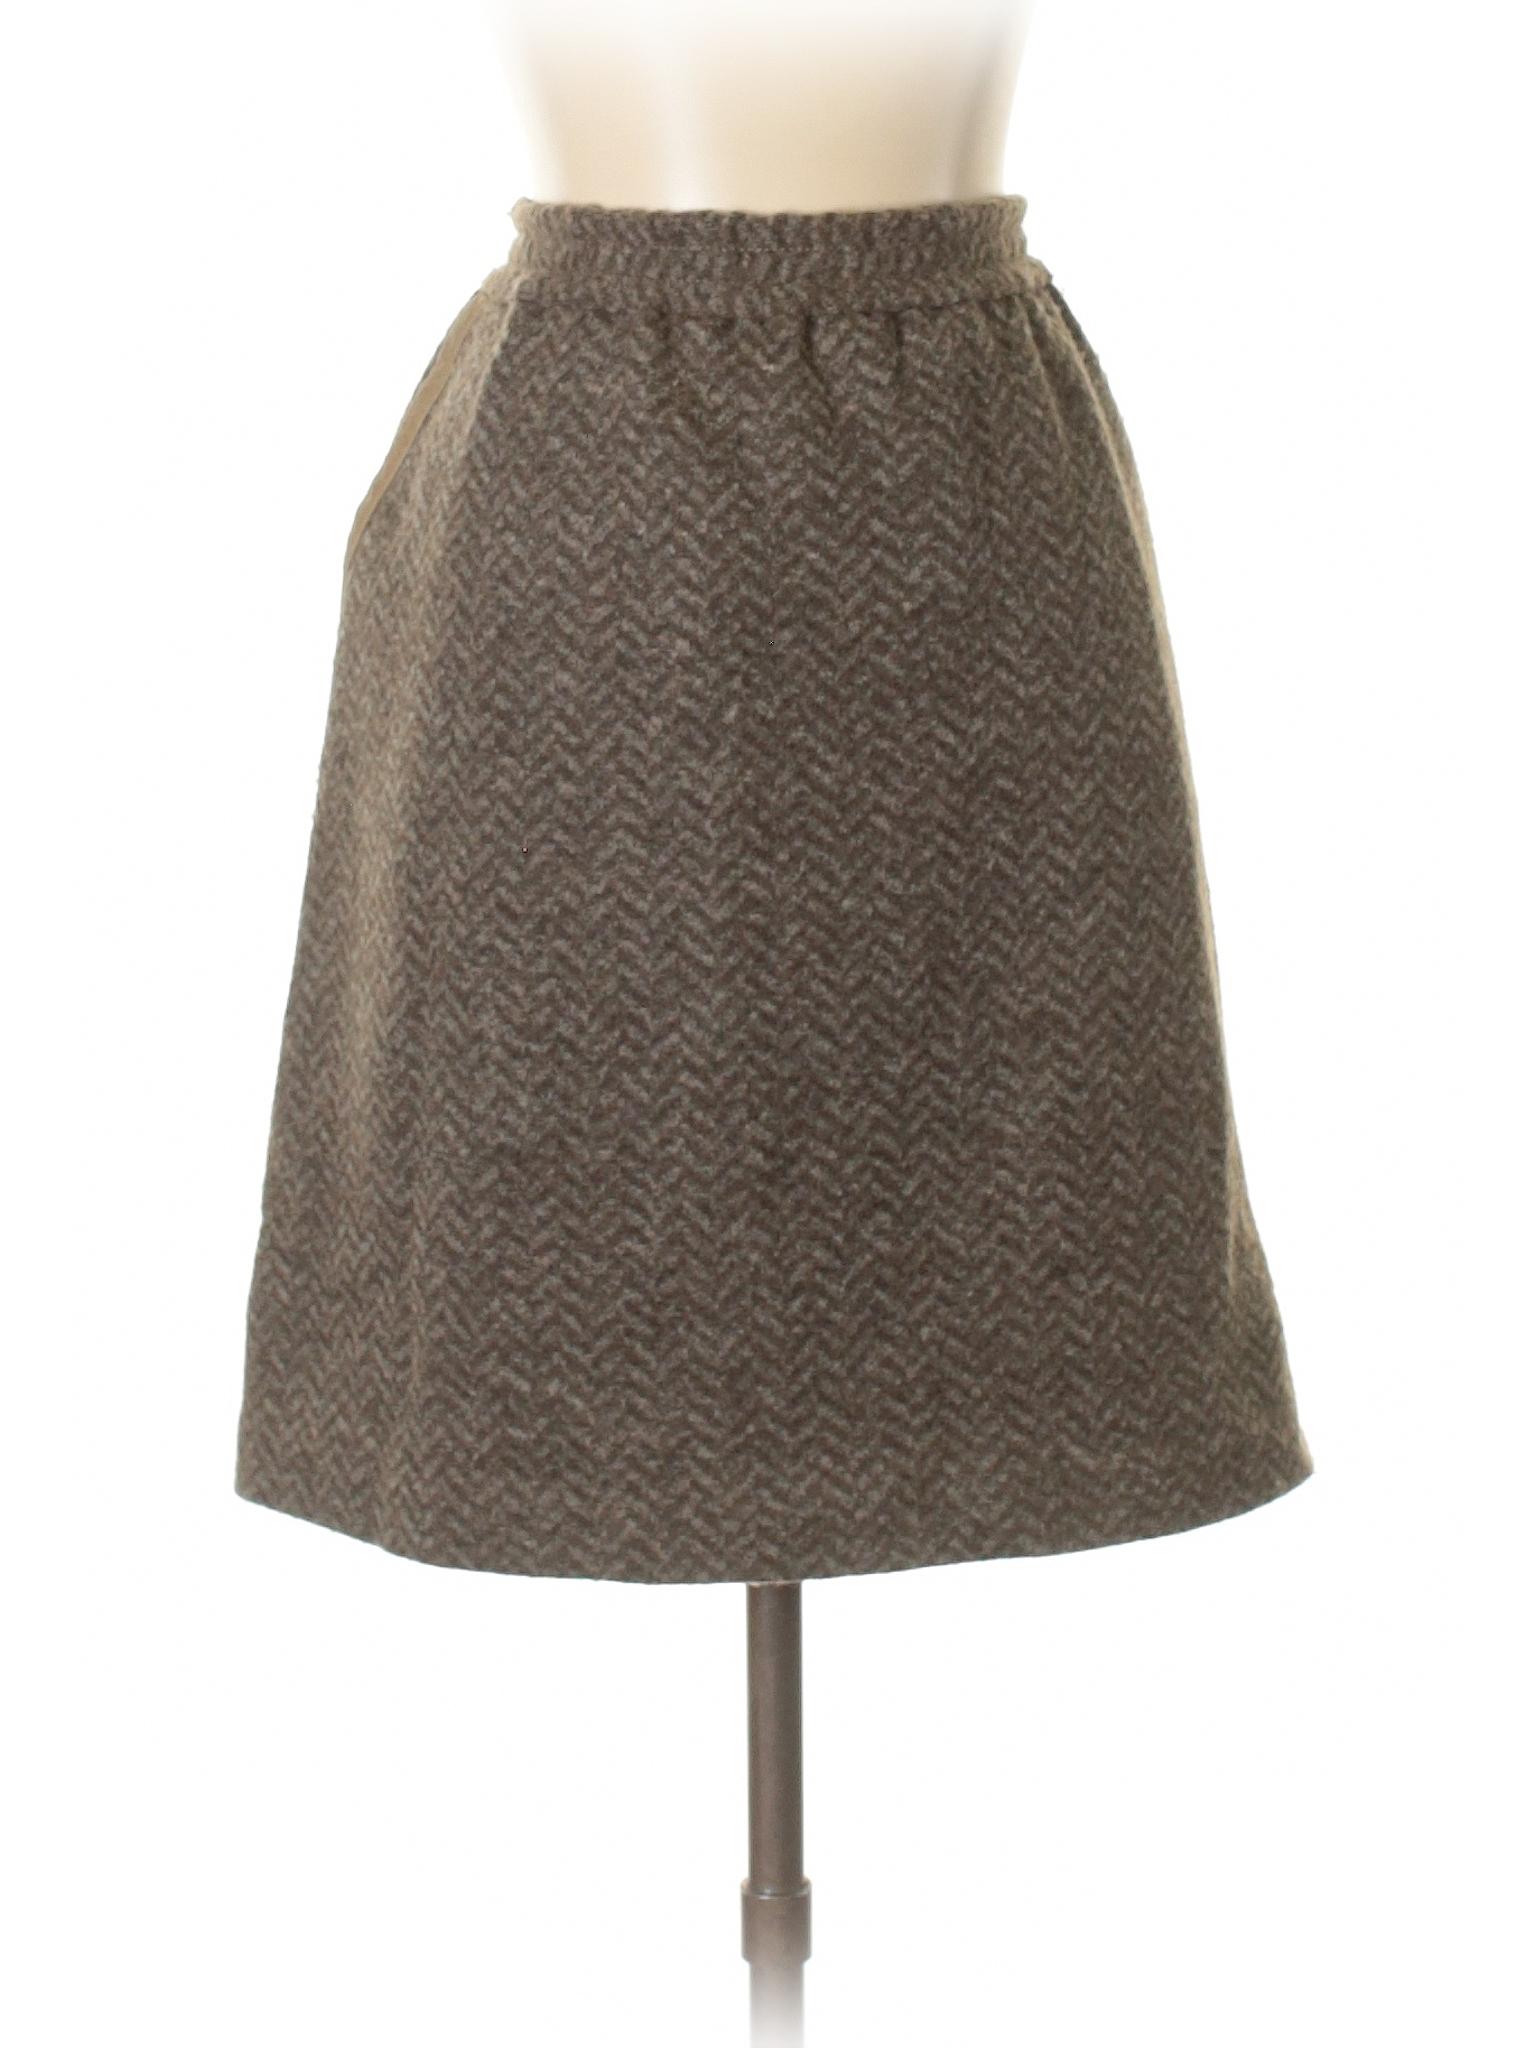 Boutique Skirt Boutique Wool Boutique Wool Wool Wool Boutique Skirt Skirt Boutique Wool Boutique Skirt Skirt Wool wfAwq